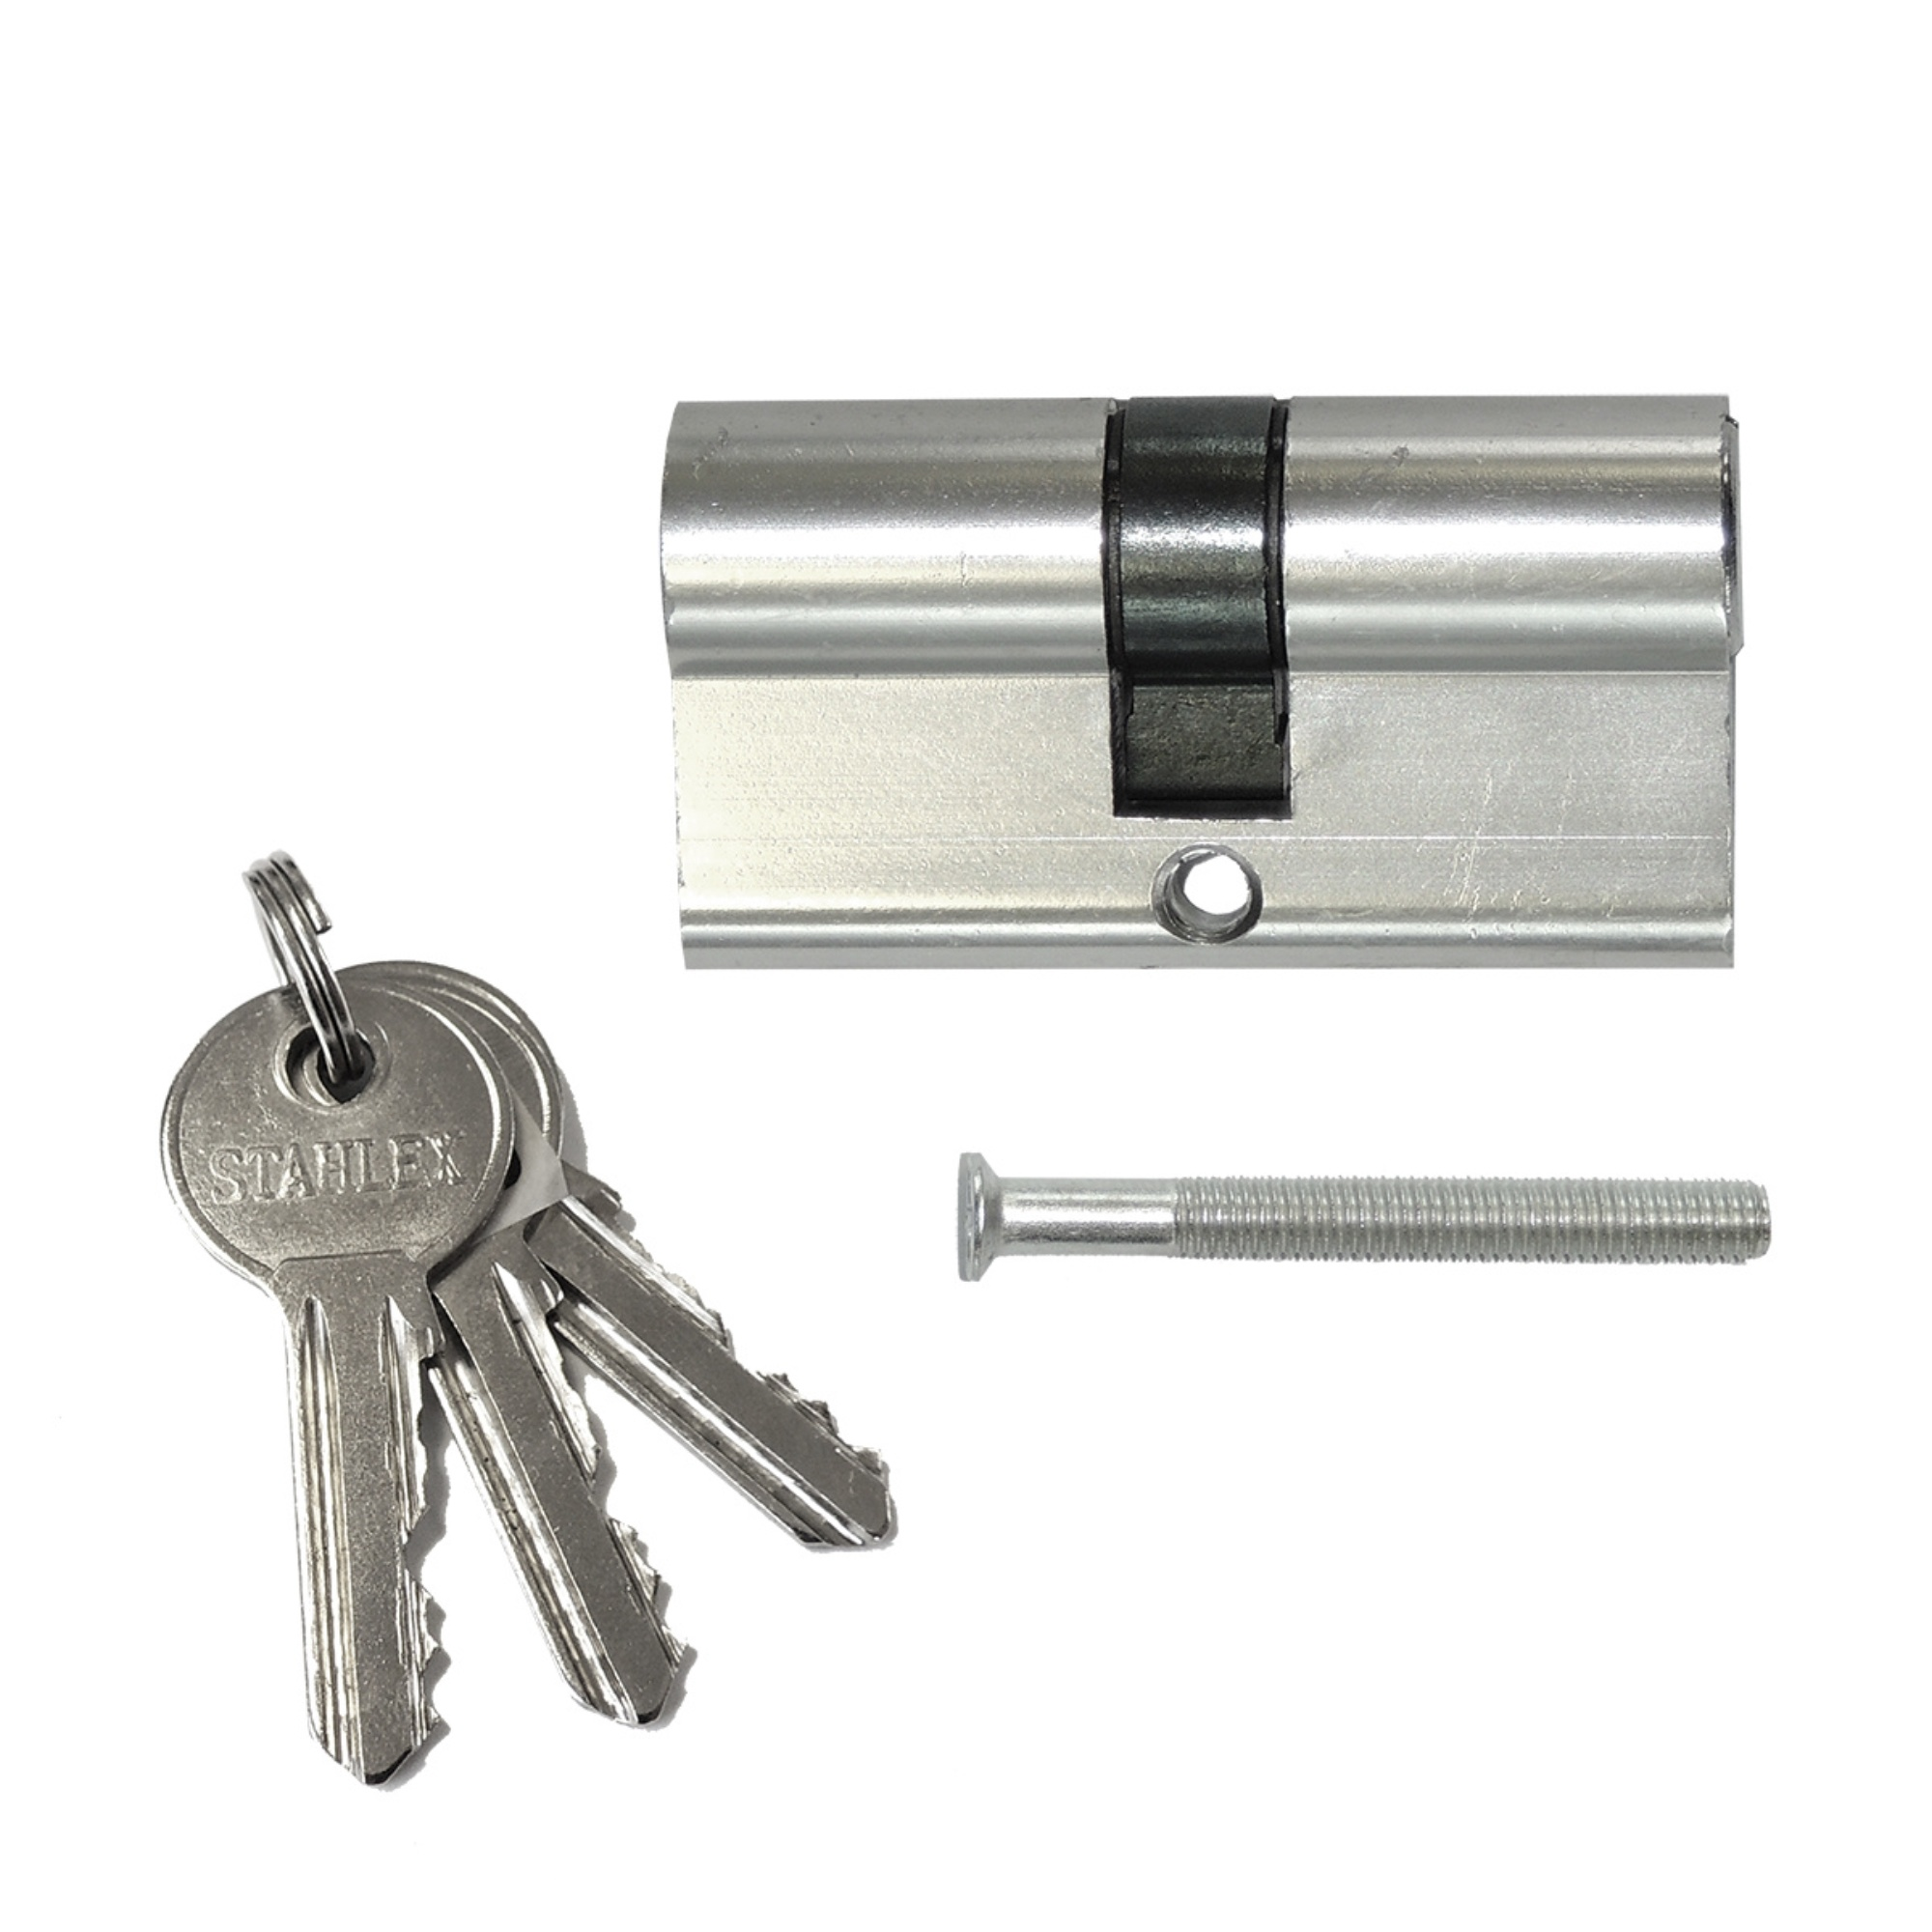 Euro profielcilinder 30/30 - 3 sleutels